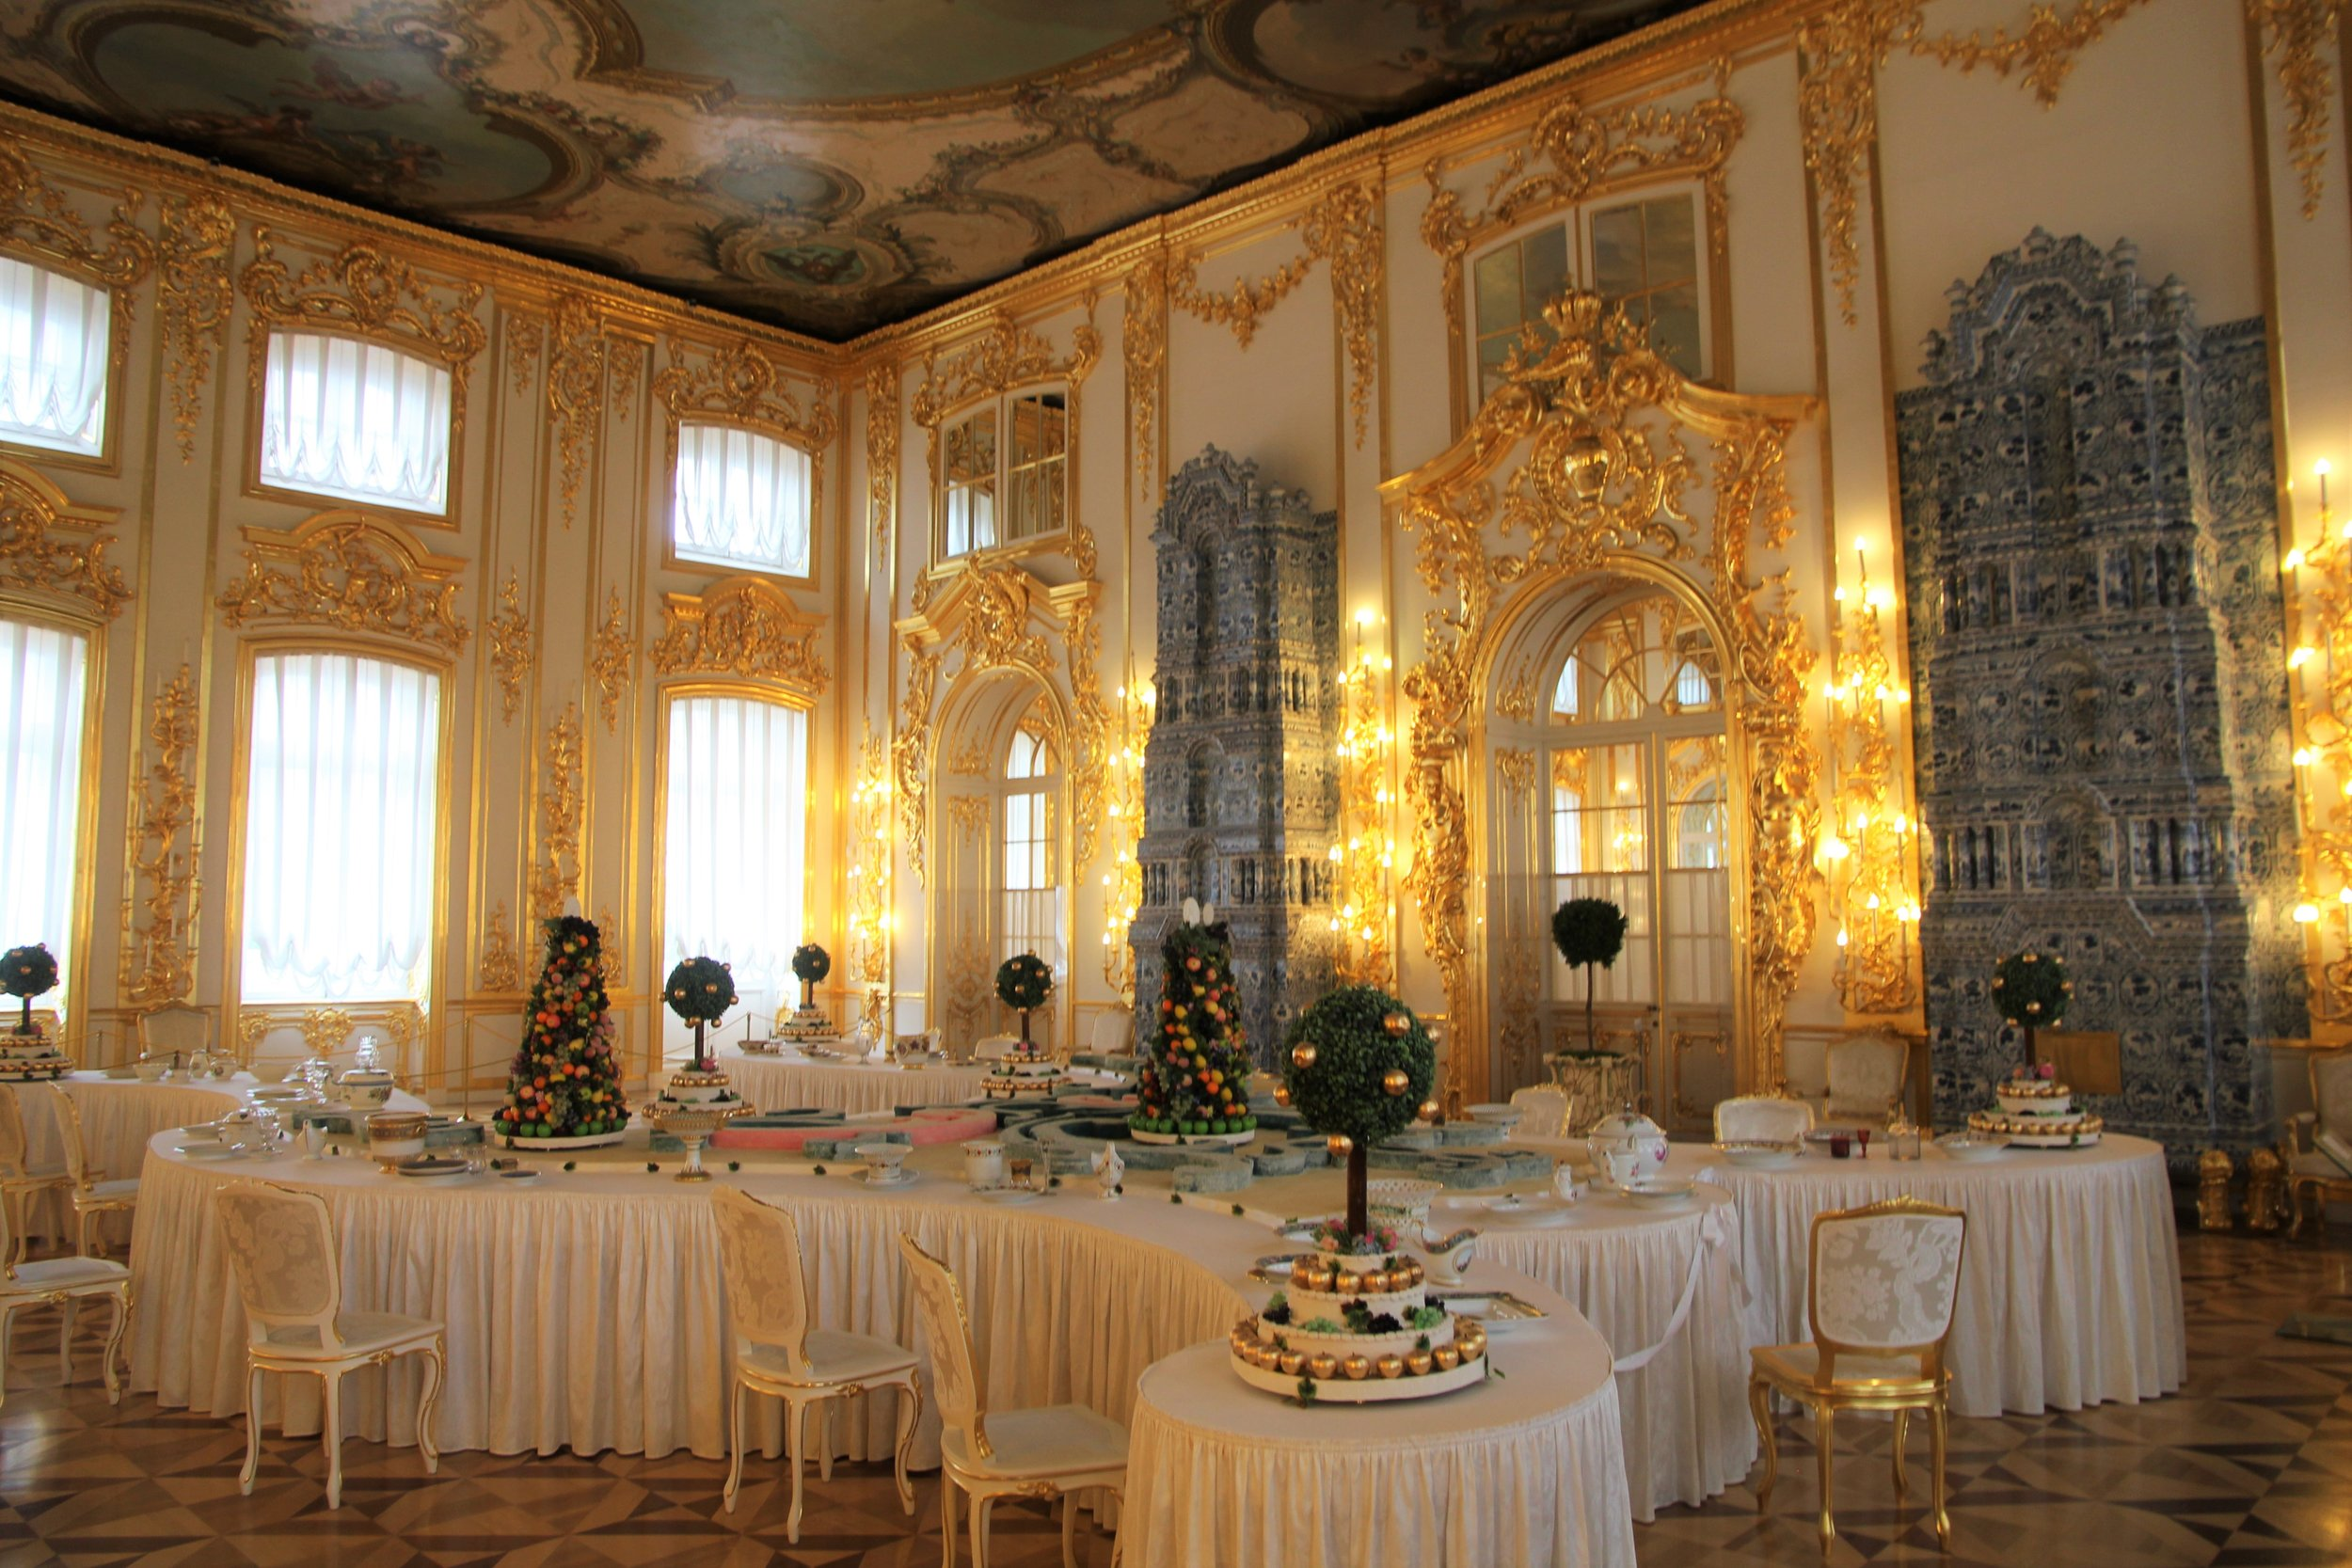 catherine-palace-room